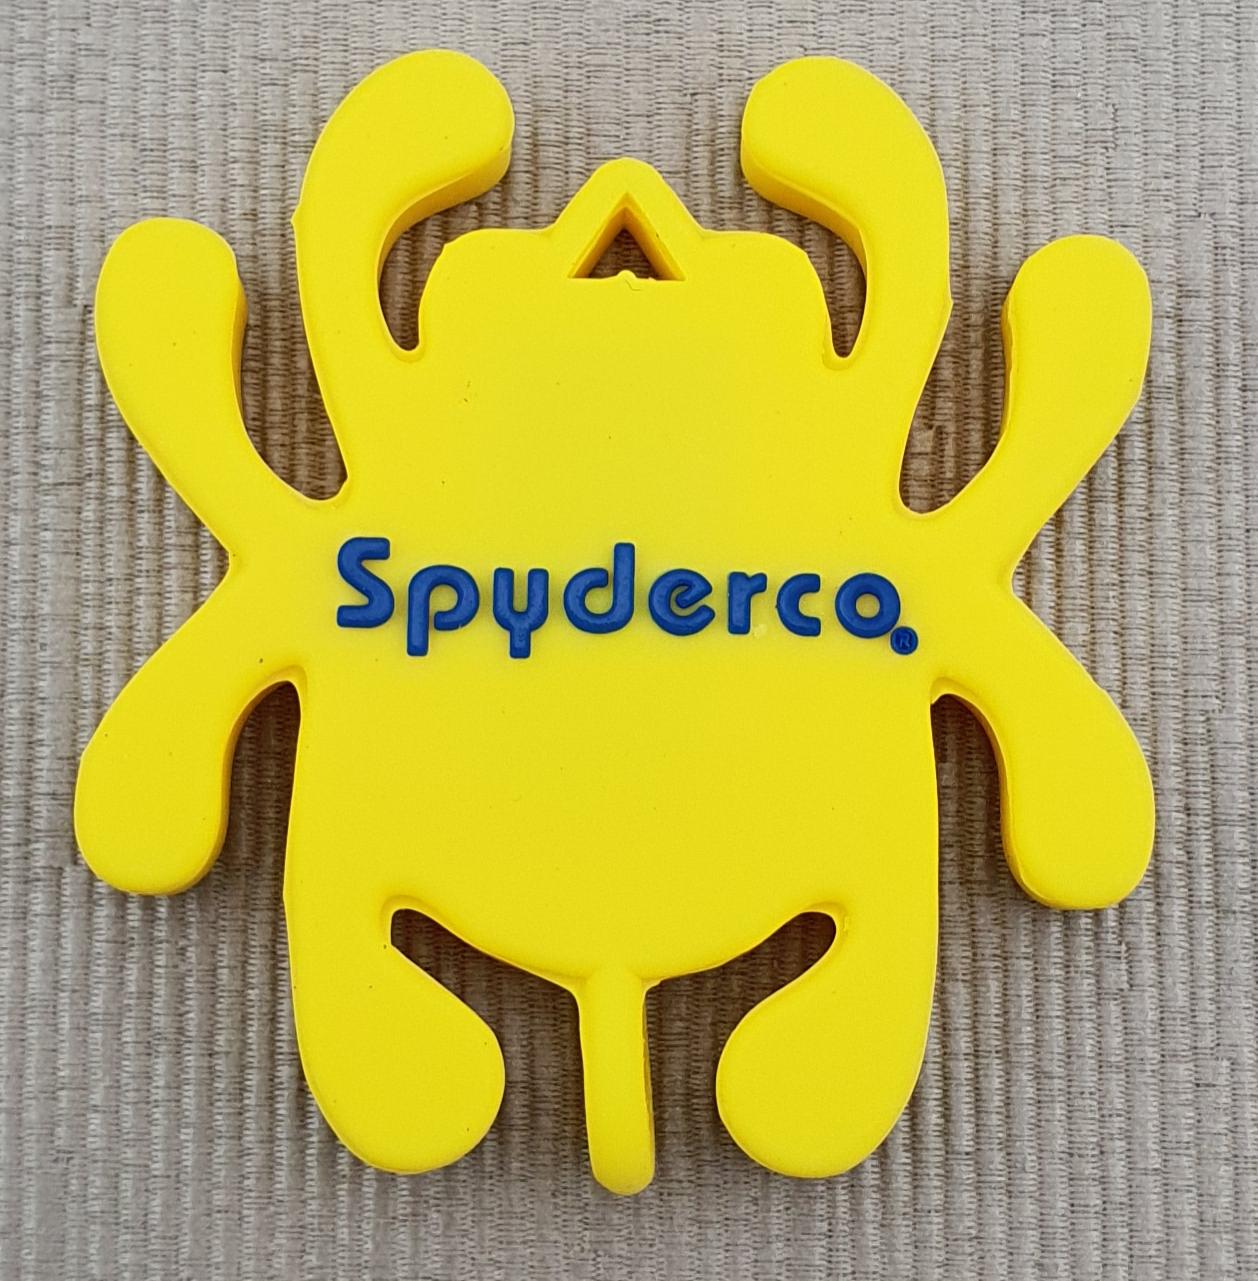 Spyderco Flashdrive yellow